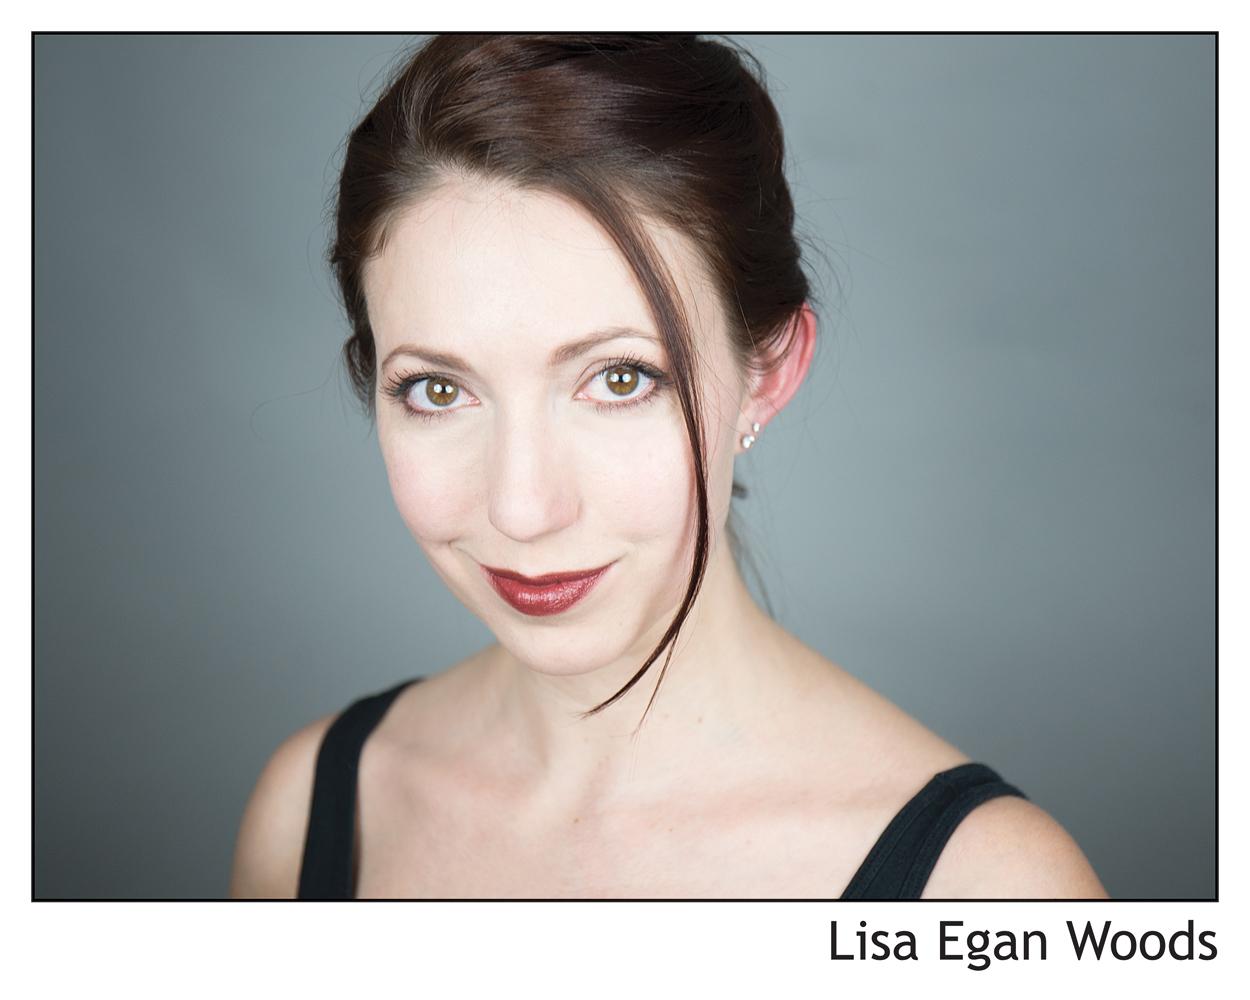 Lisa Egan Woods